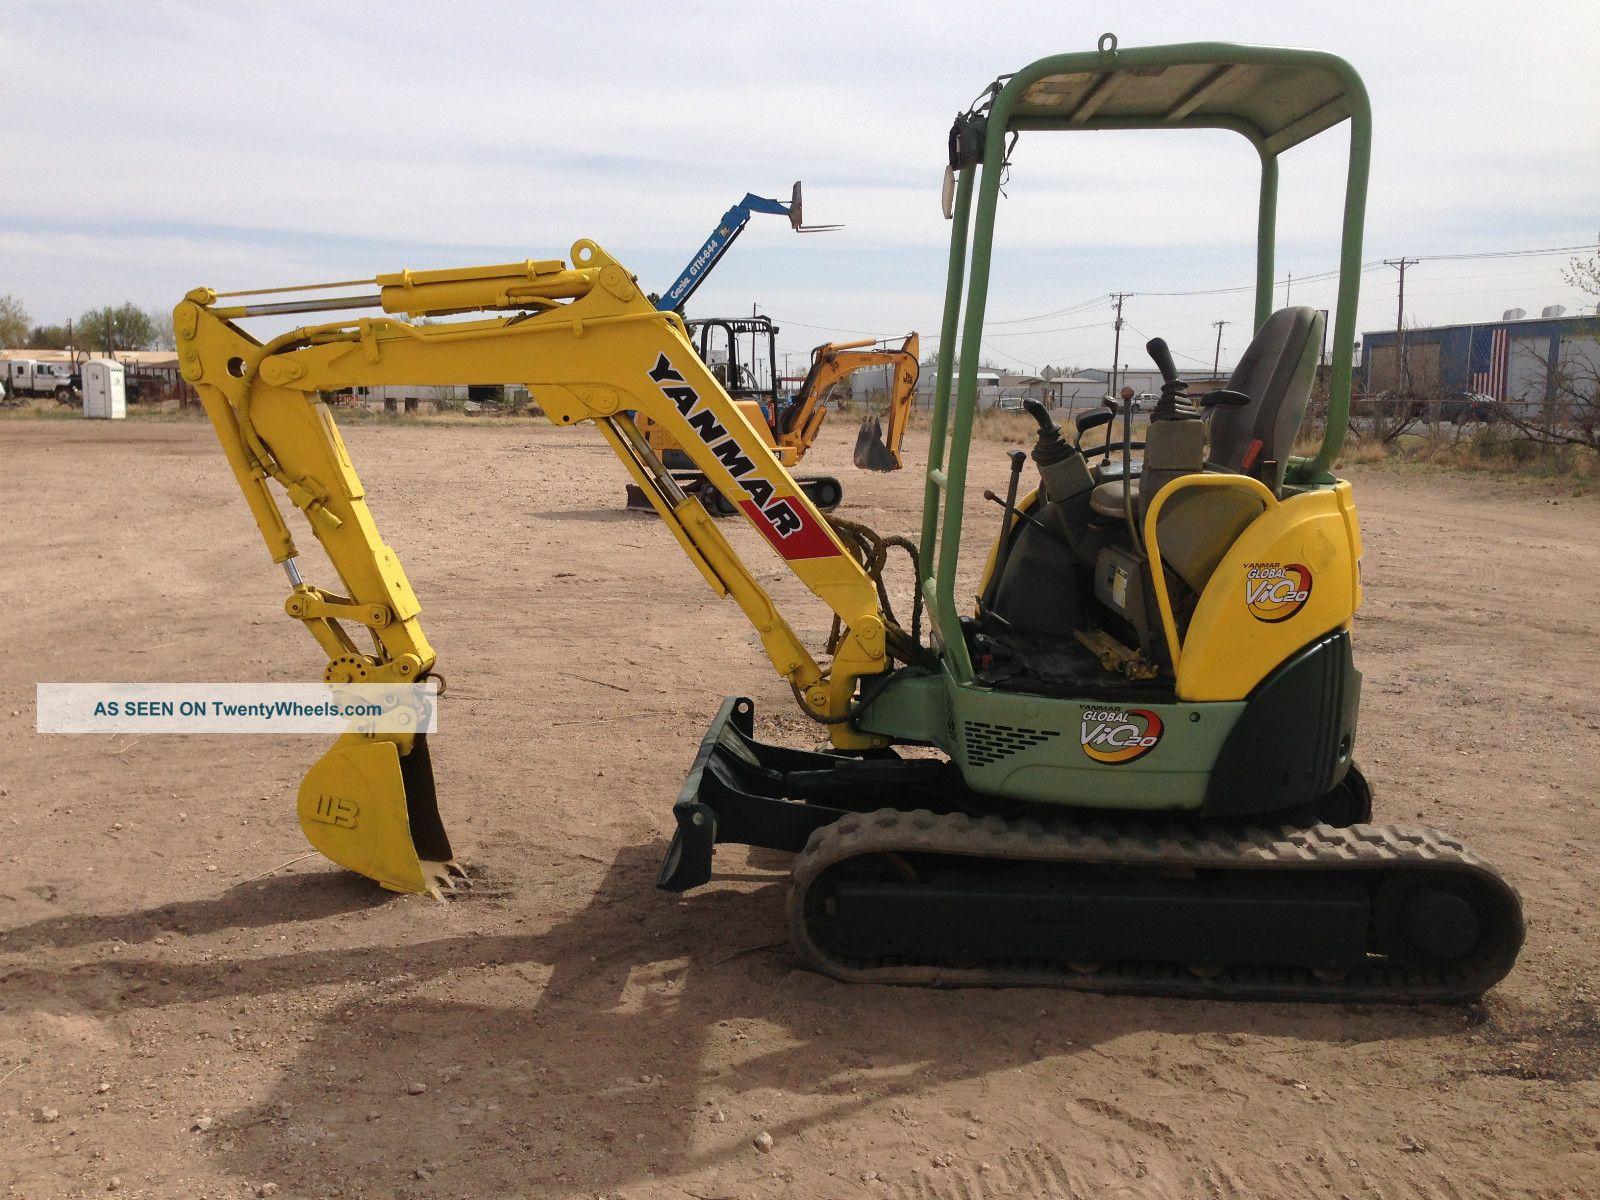 Yanmar Vio20 - 3 Rubber Hydraulic Track Excavator Dozer Loader Diesel Bob Cat Excavators photo